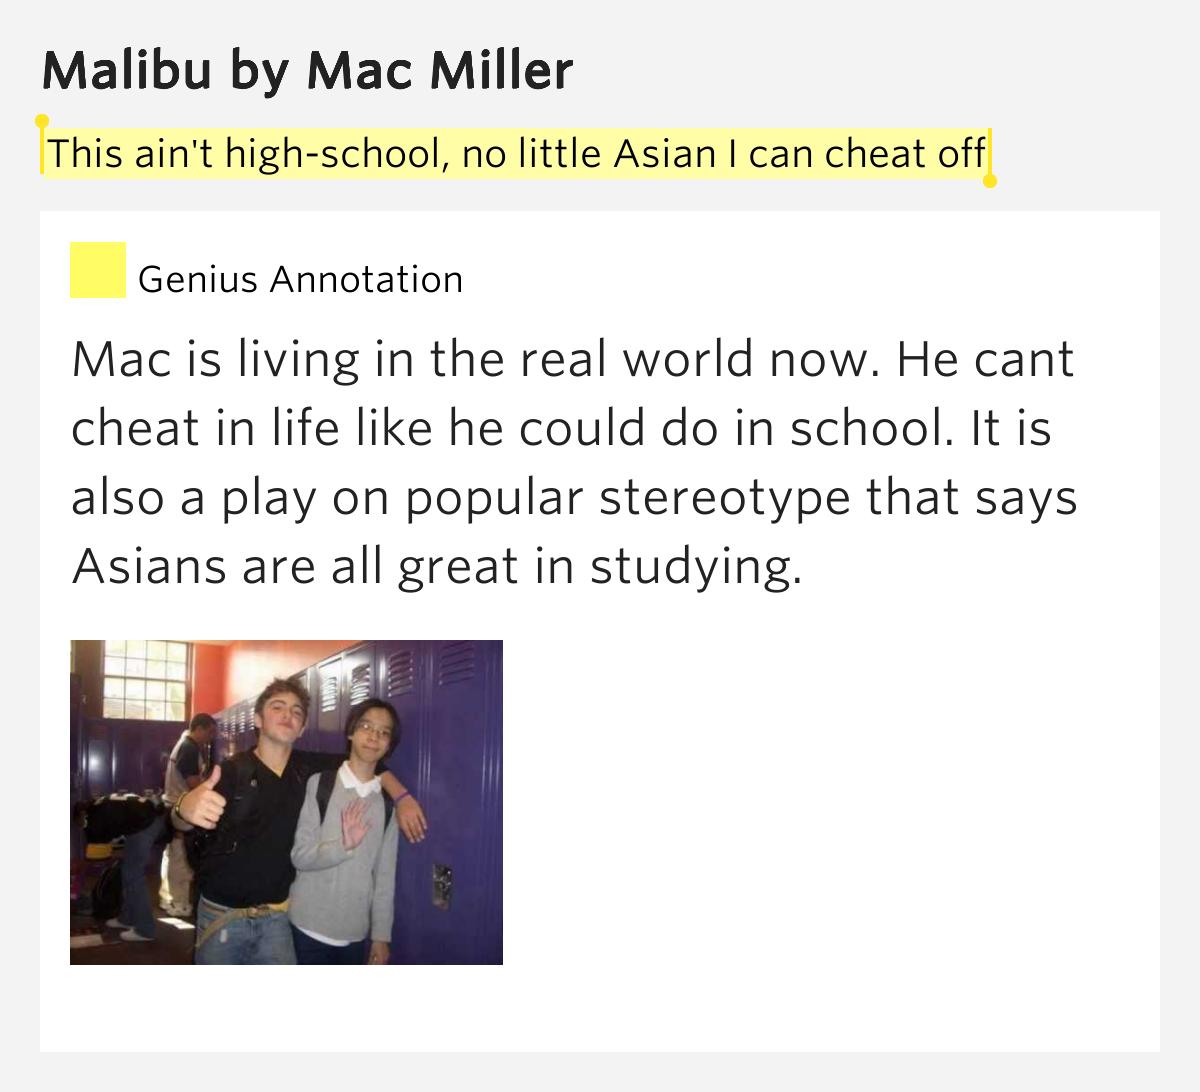 Mac Miller - Malibu (FACES) - YouTube